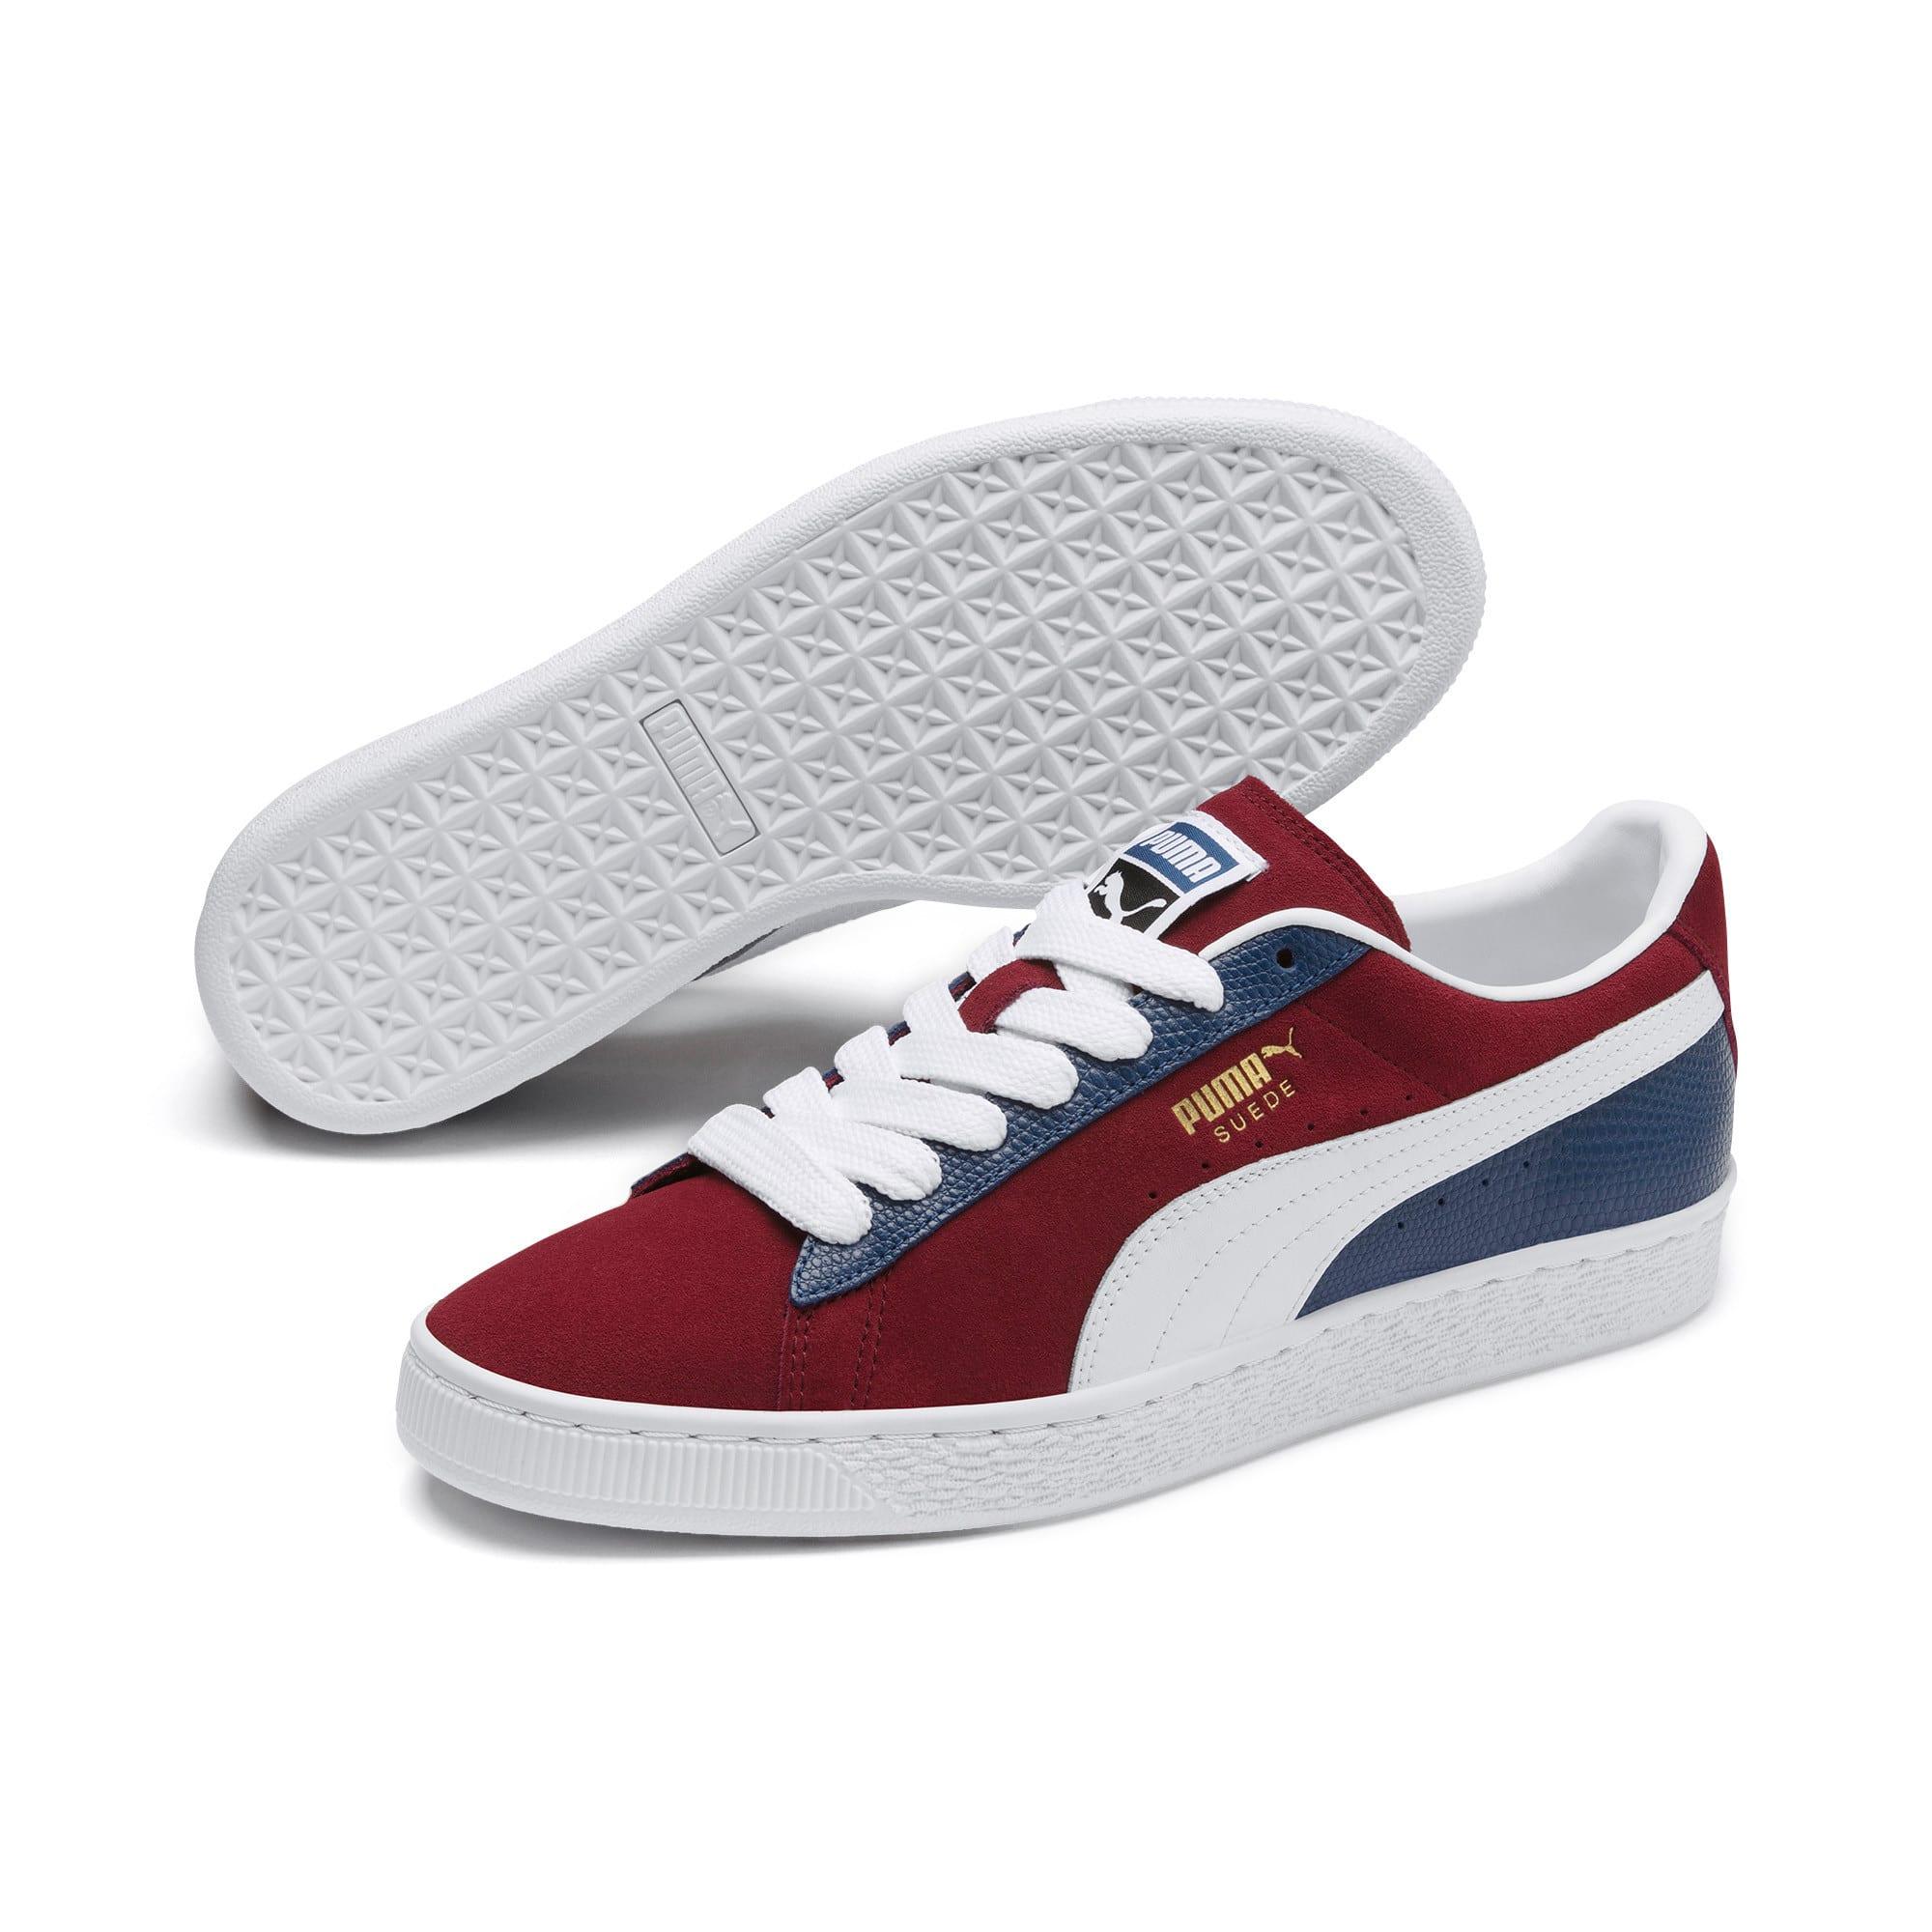 Thumbnail 2 of Suede Classic Block Sneakers, Rhubarb- Blue-White, medium